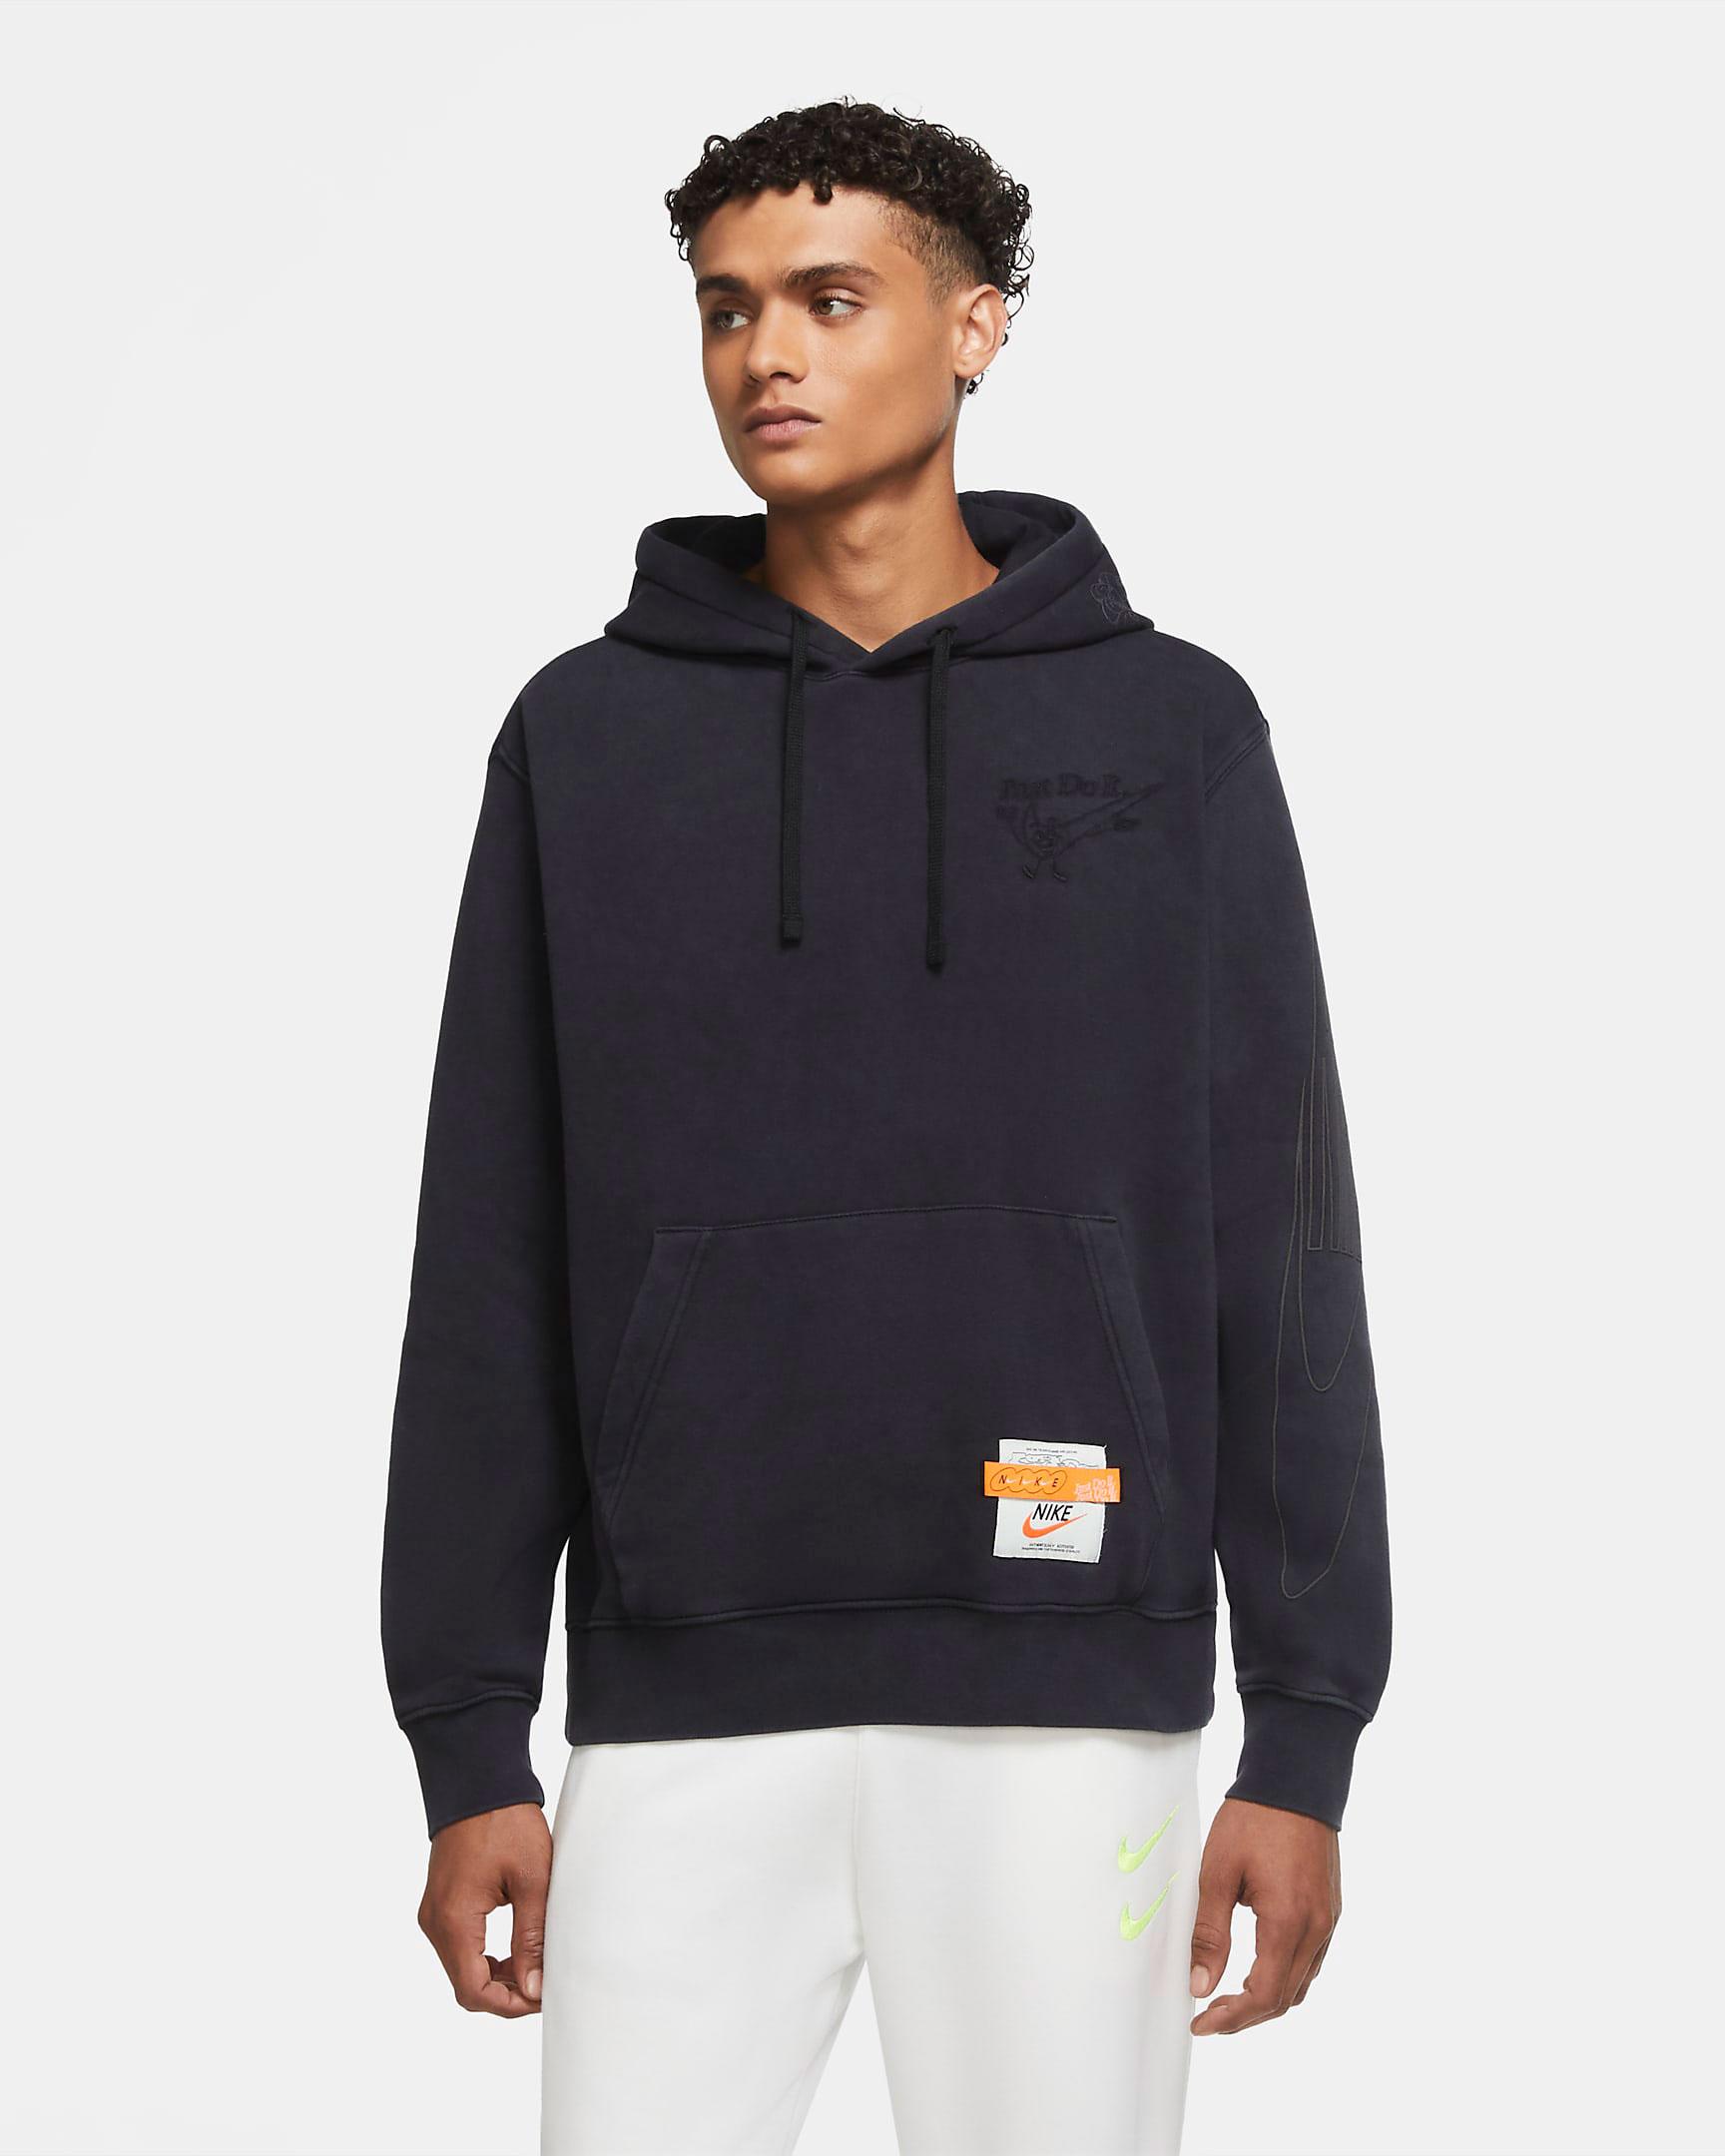 nike-air-force-1-orange-skeleton-matching-hoodie-1